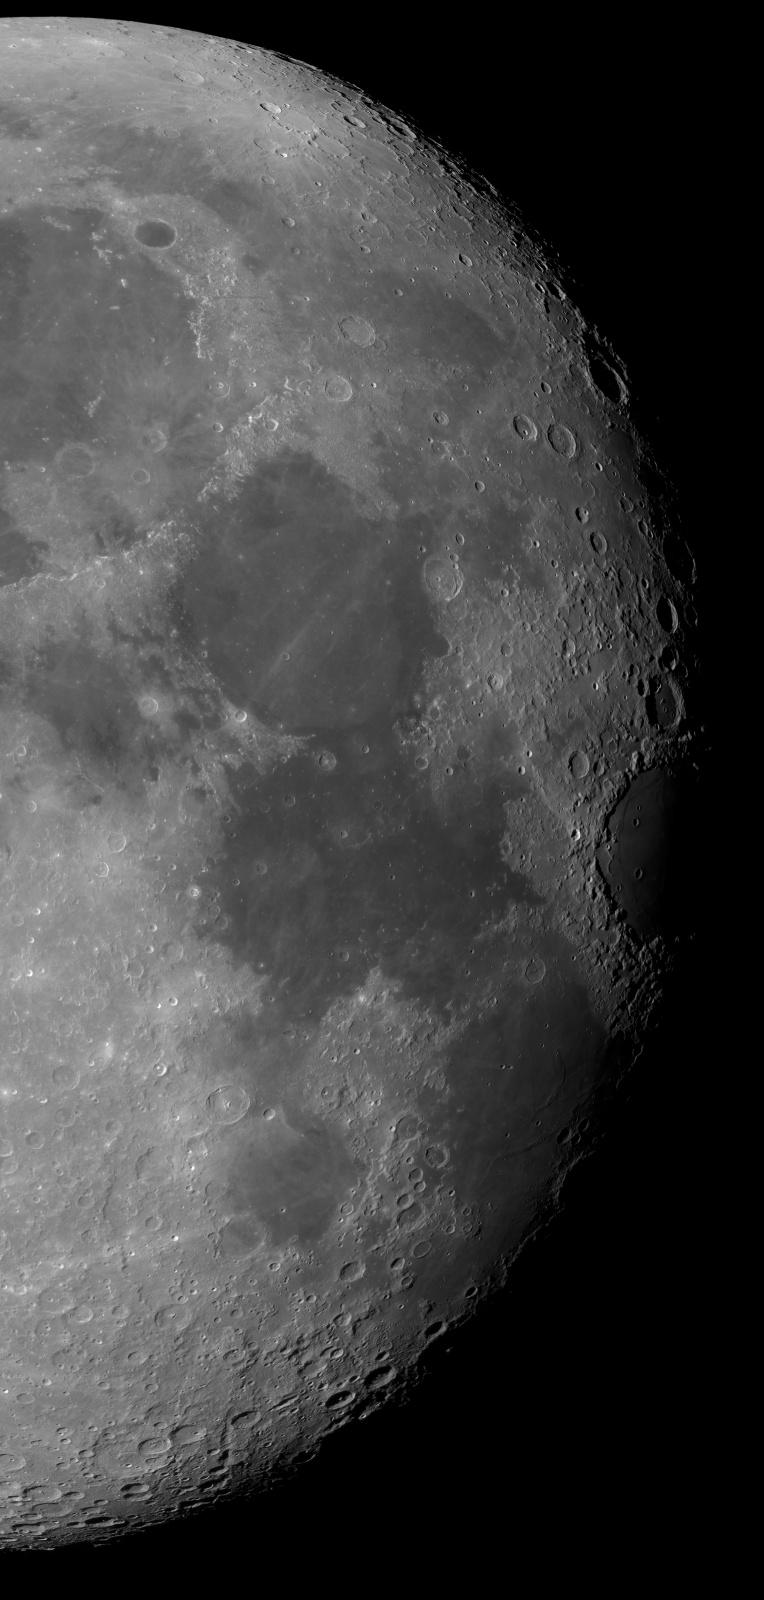 Half_Moon_2020-07-08T02_40_21.thumb.jpg.7c2dfa87f113eafe27b8c687524f0252.jpg